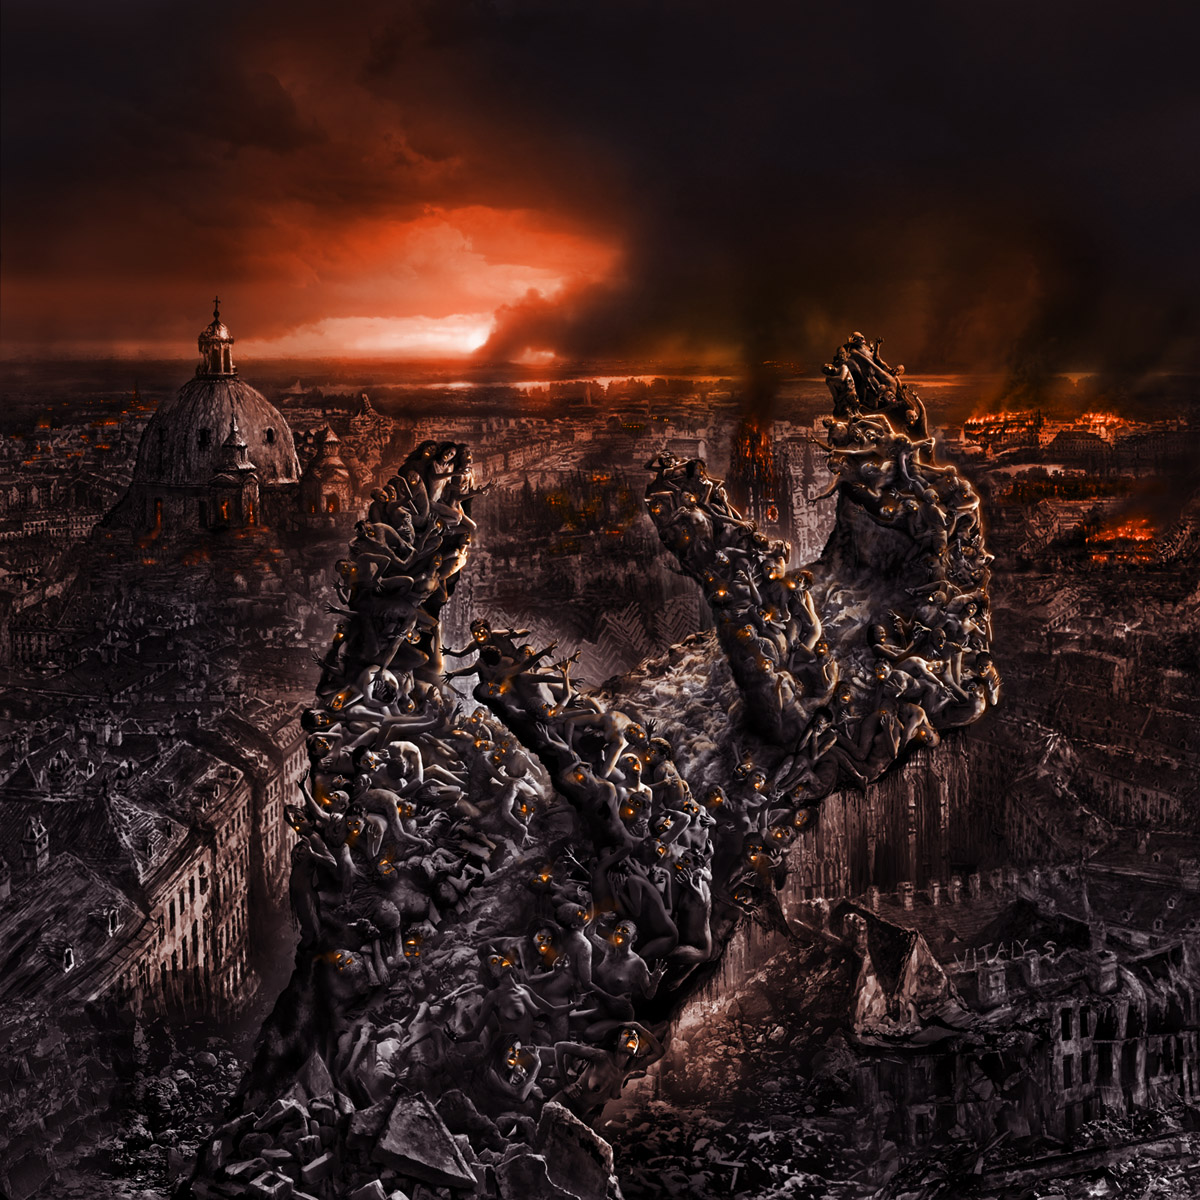 chronicles_of_devastation_by_alexiuss-d474xvy.jpg